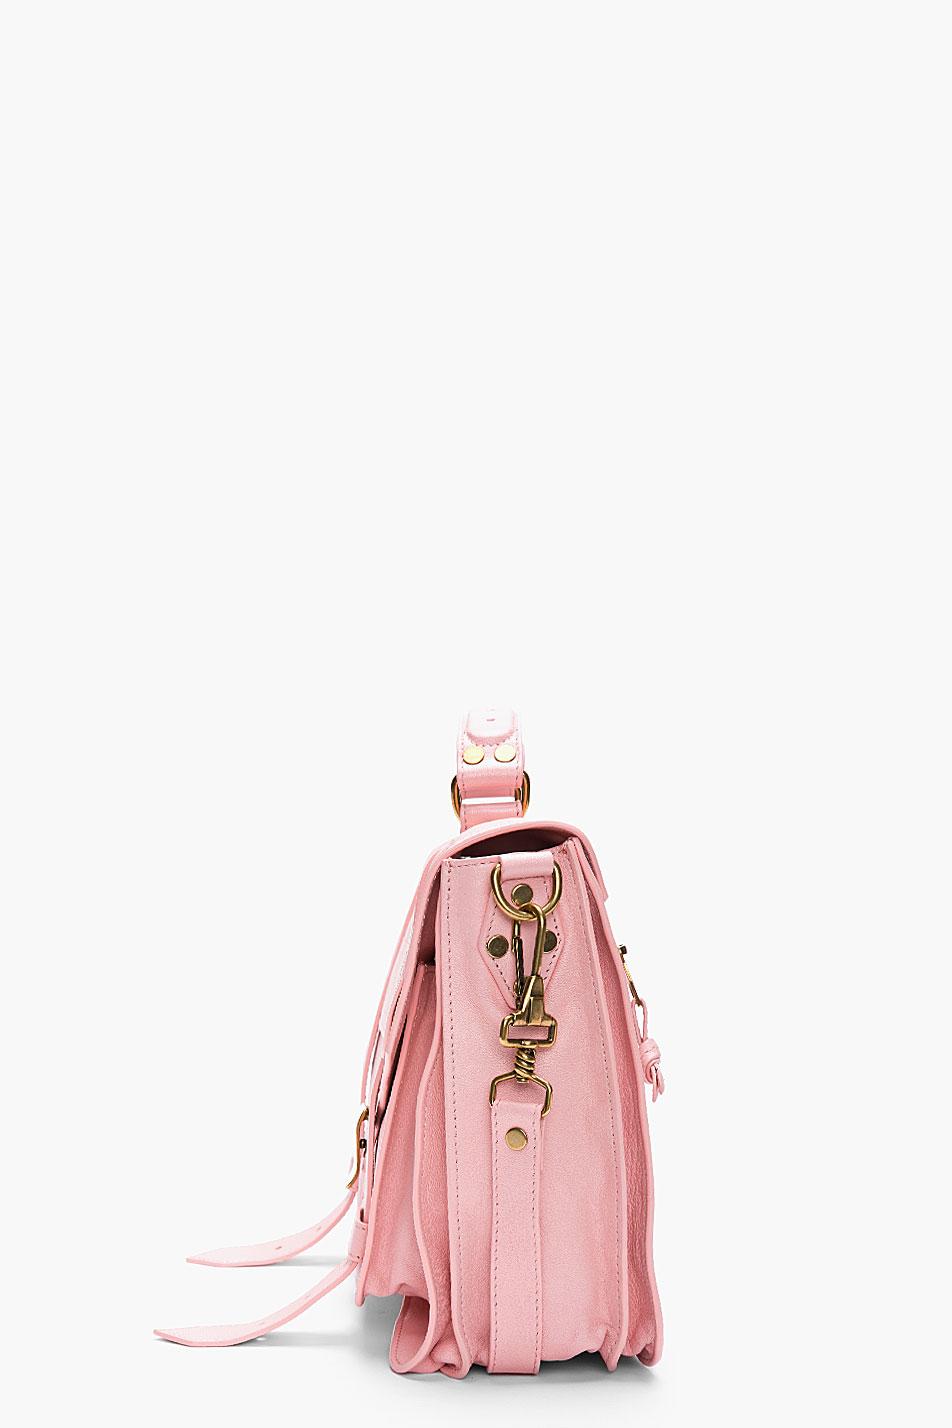 9622a3dd31 Lyst - Proenza Schouler Piglet Pink Leather Foldover Ps1 Messenger ...